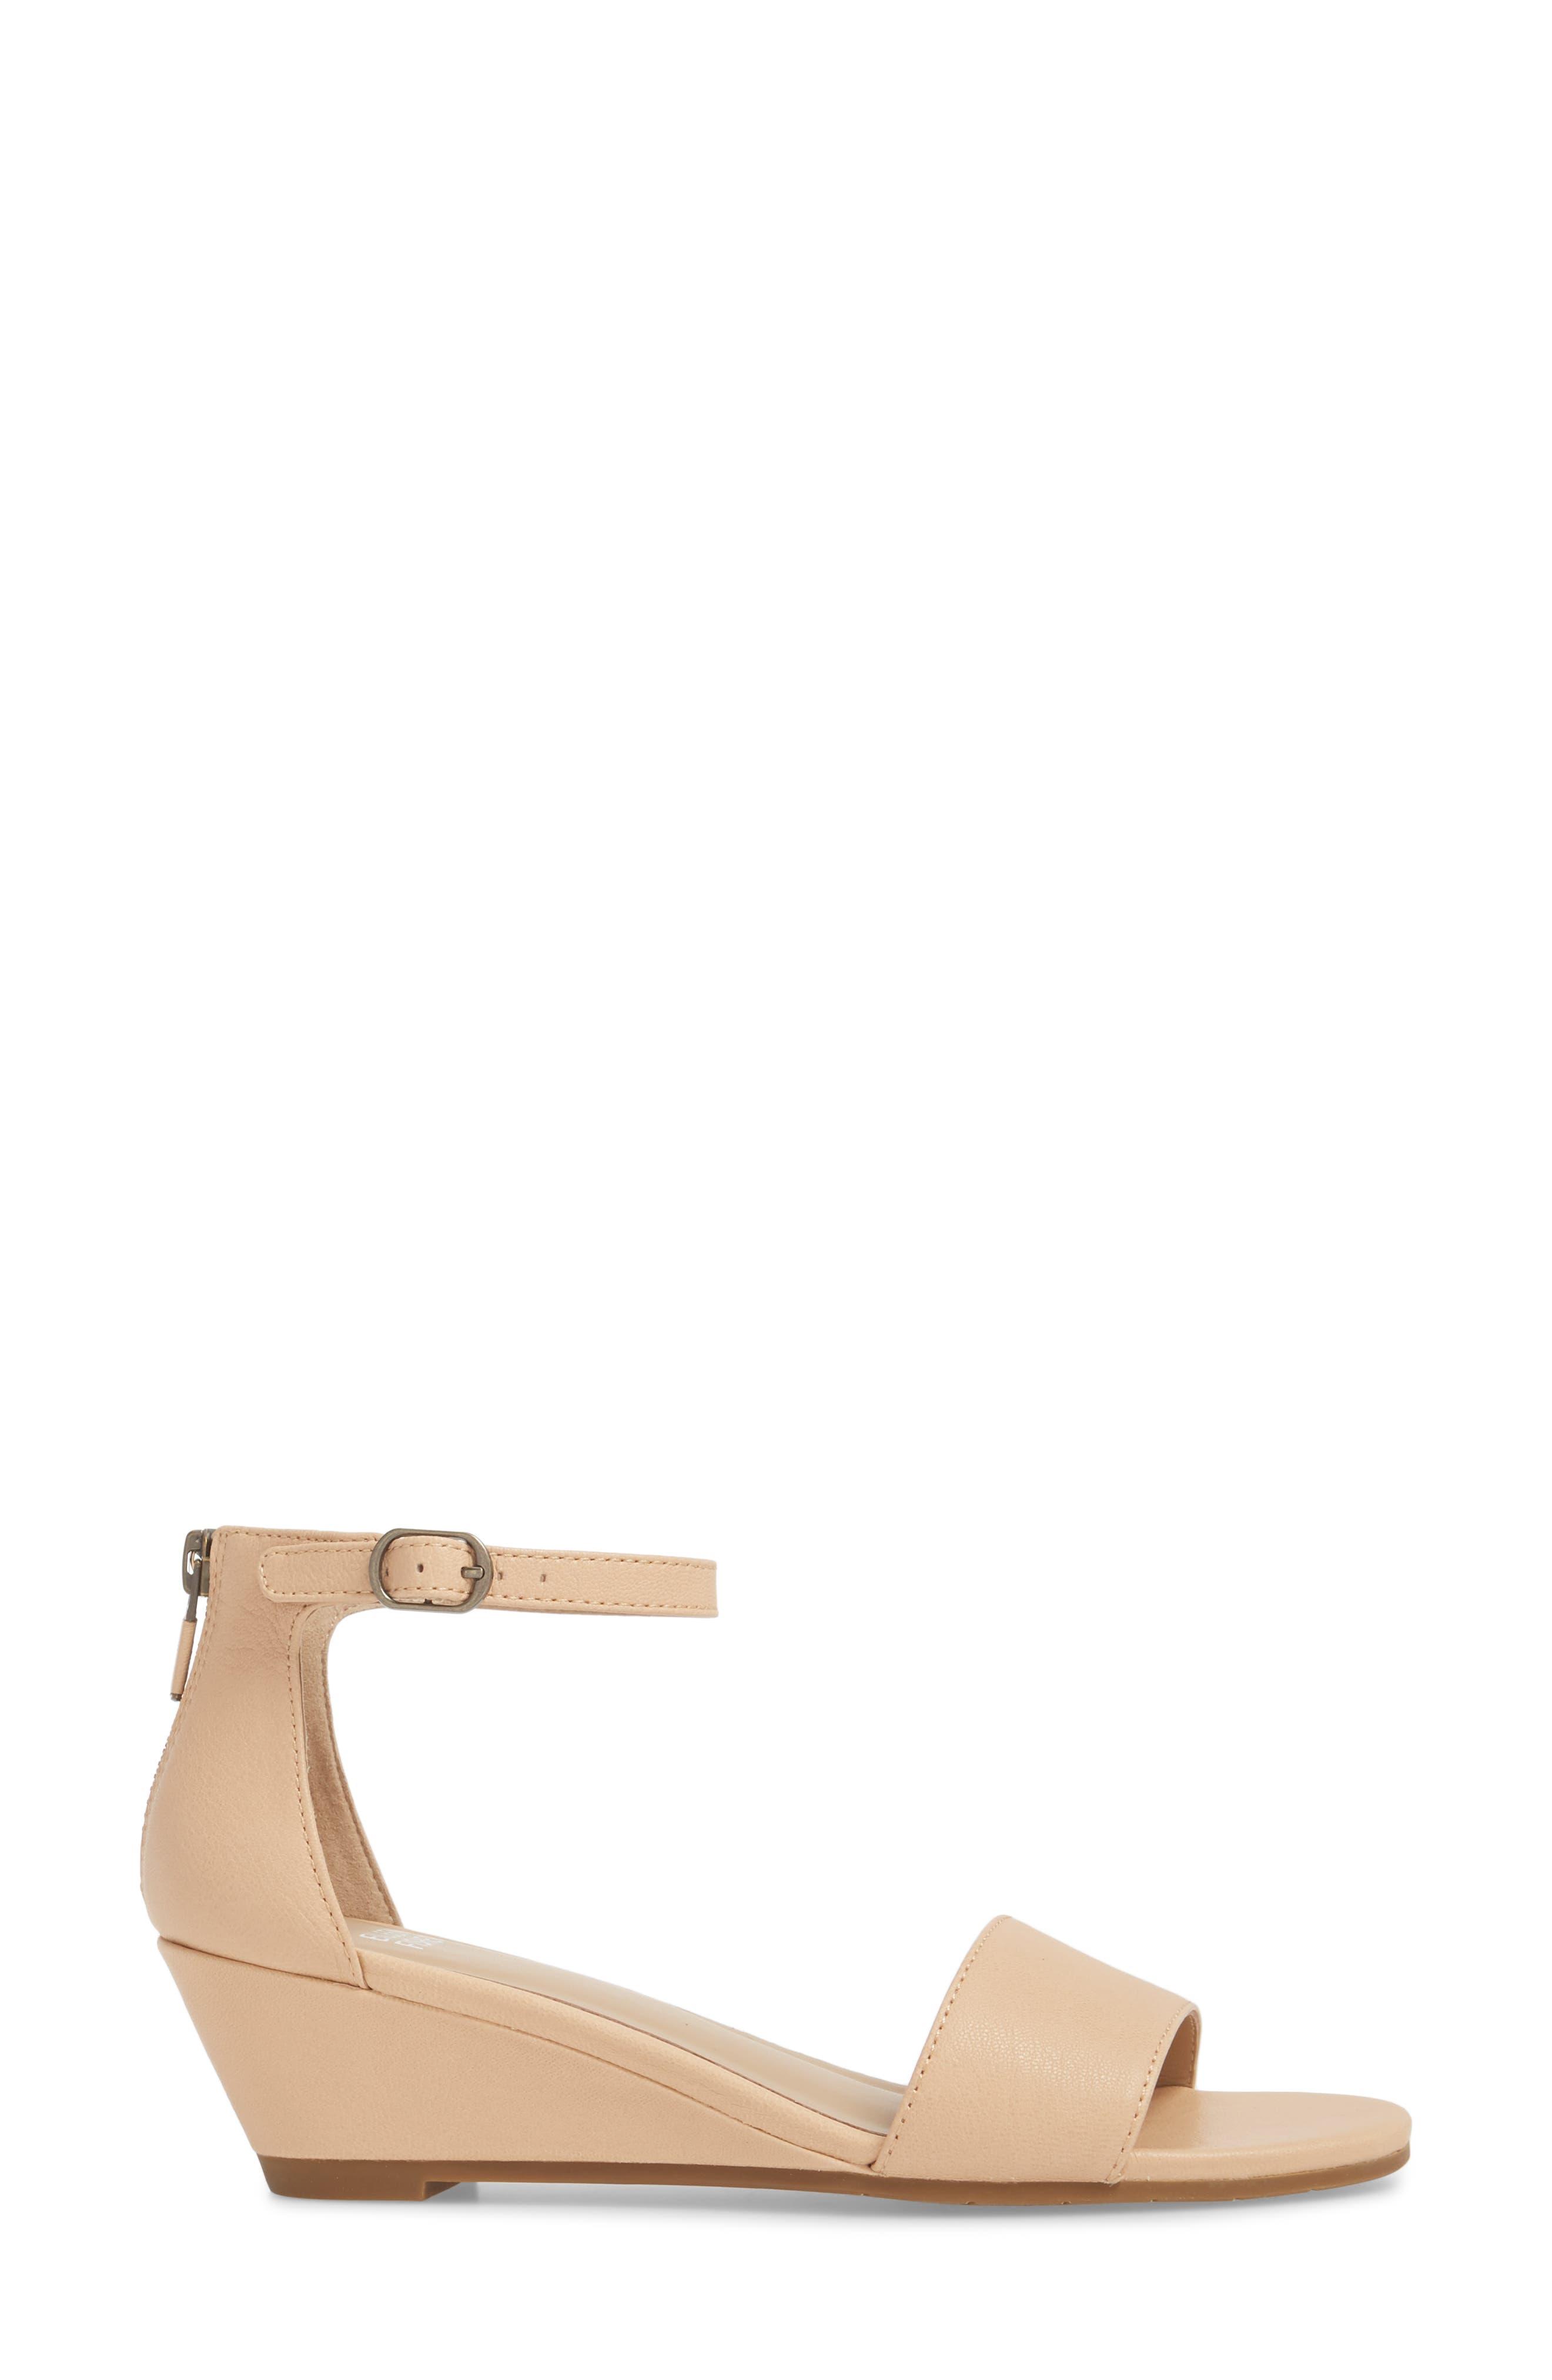 Mara Ankle Strap Wedge Sandal,                             Alternate thumbnail 10, color,